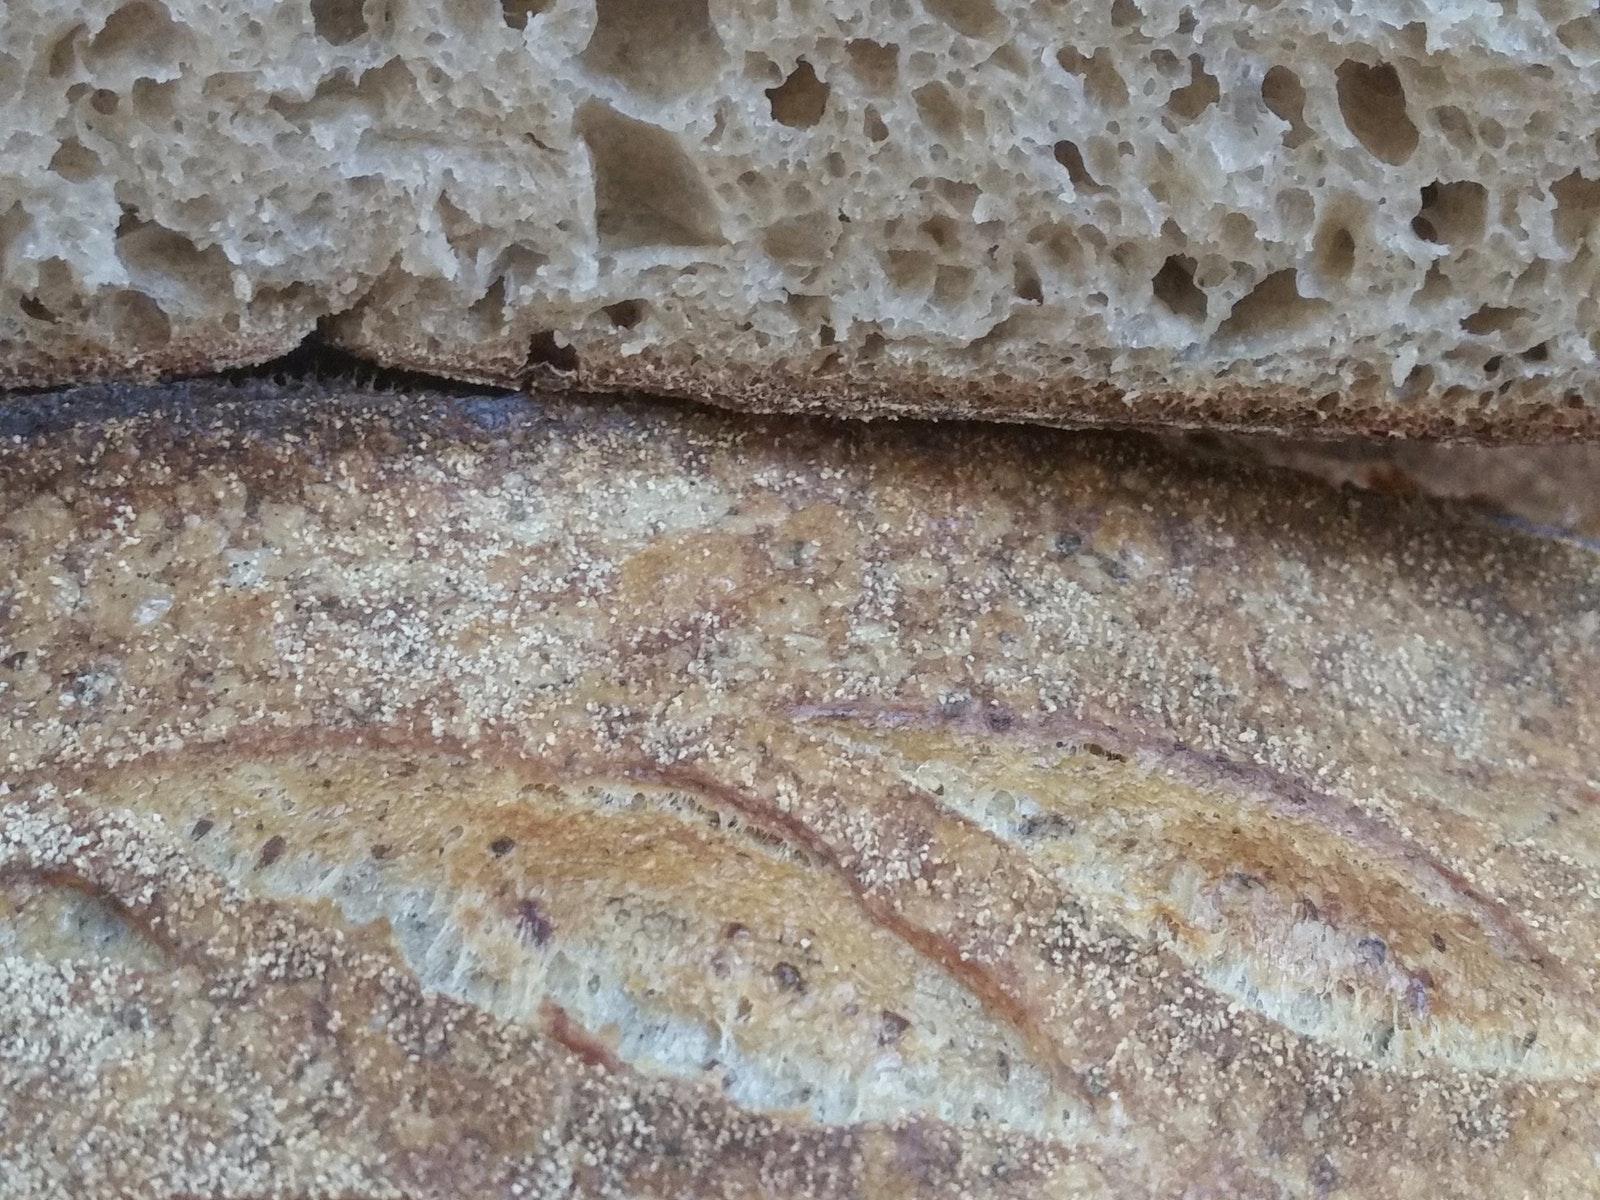 A loaf of sourdough